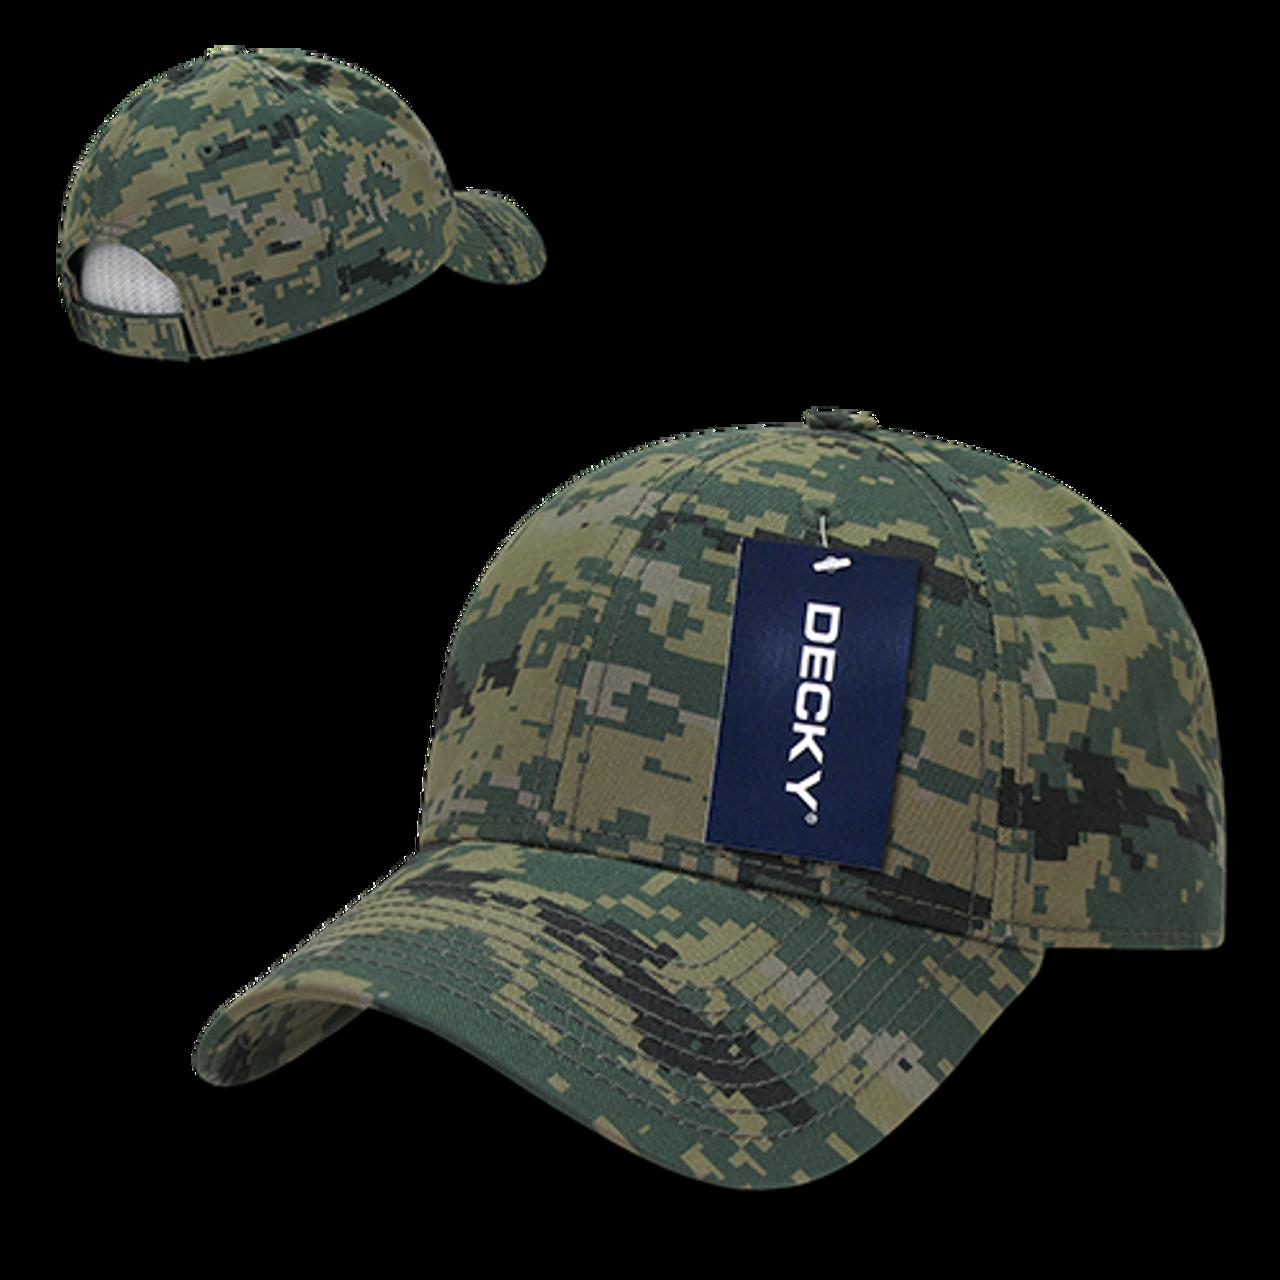 61b5d8a3 Structured Camo Baseball Cap - MCU MARPAT Camouflage